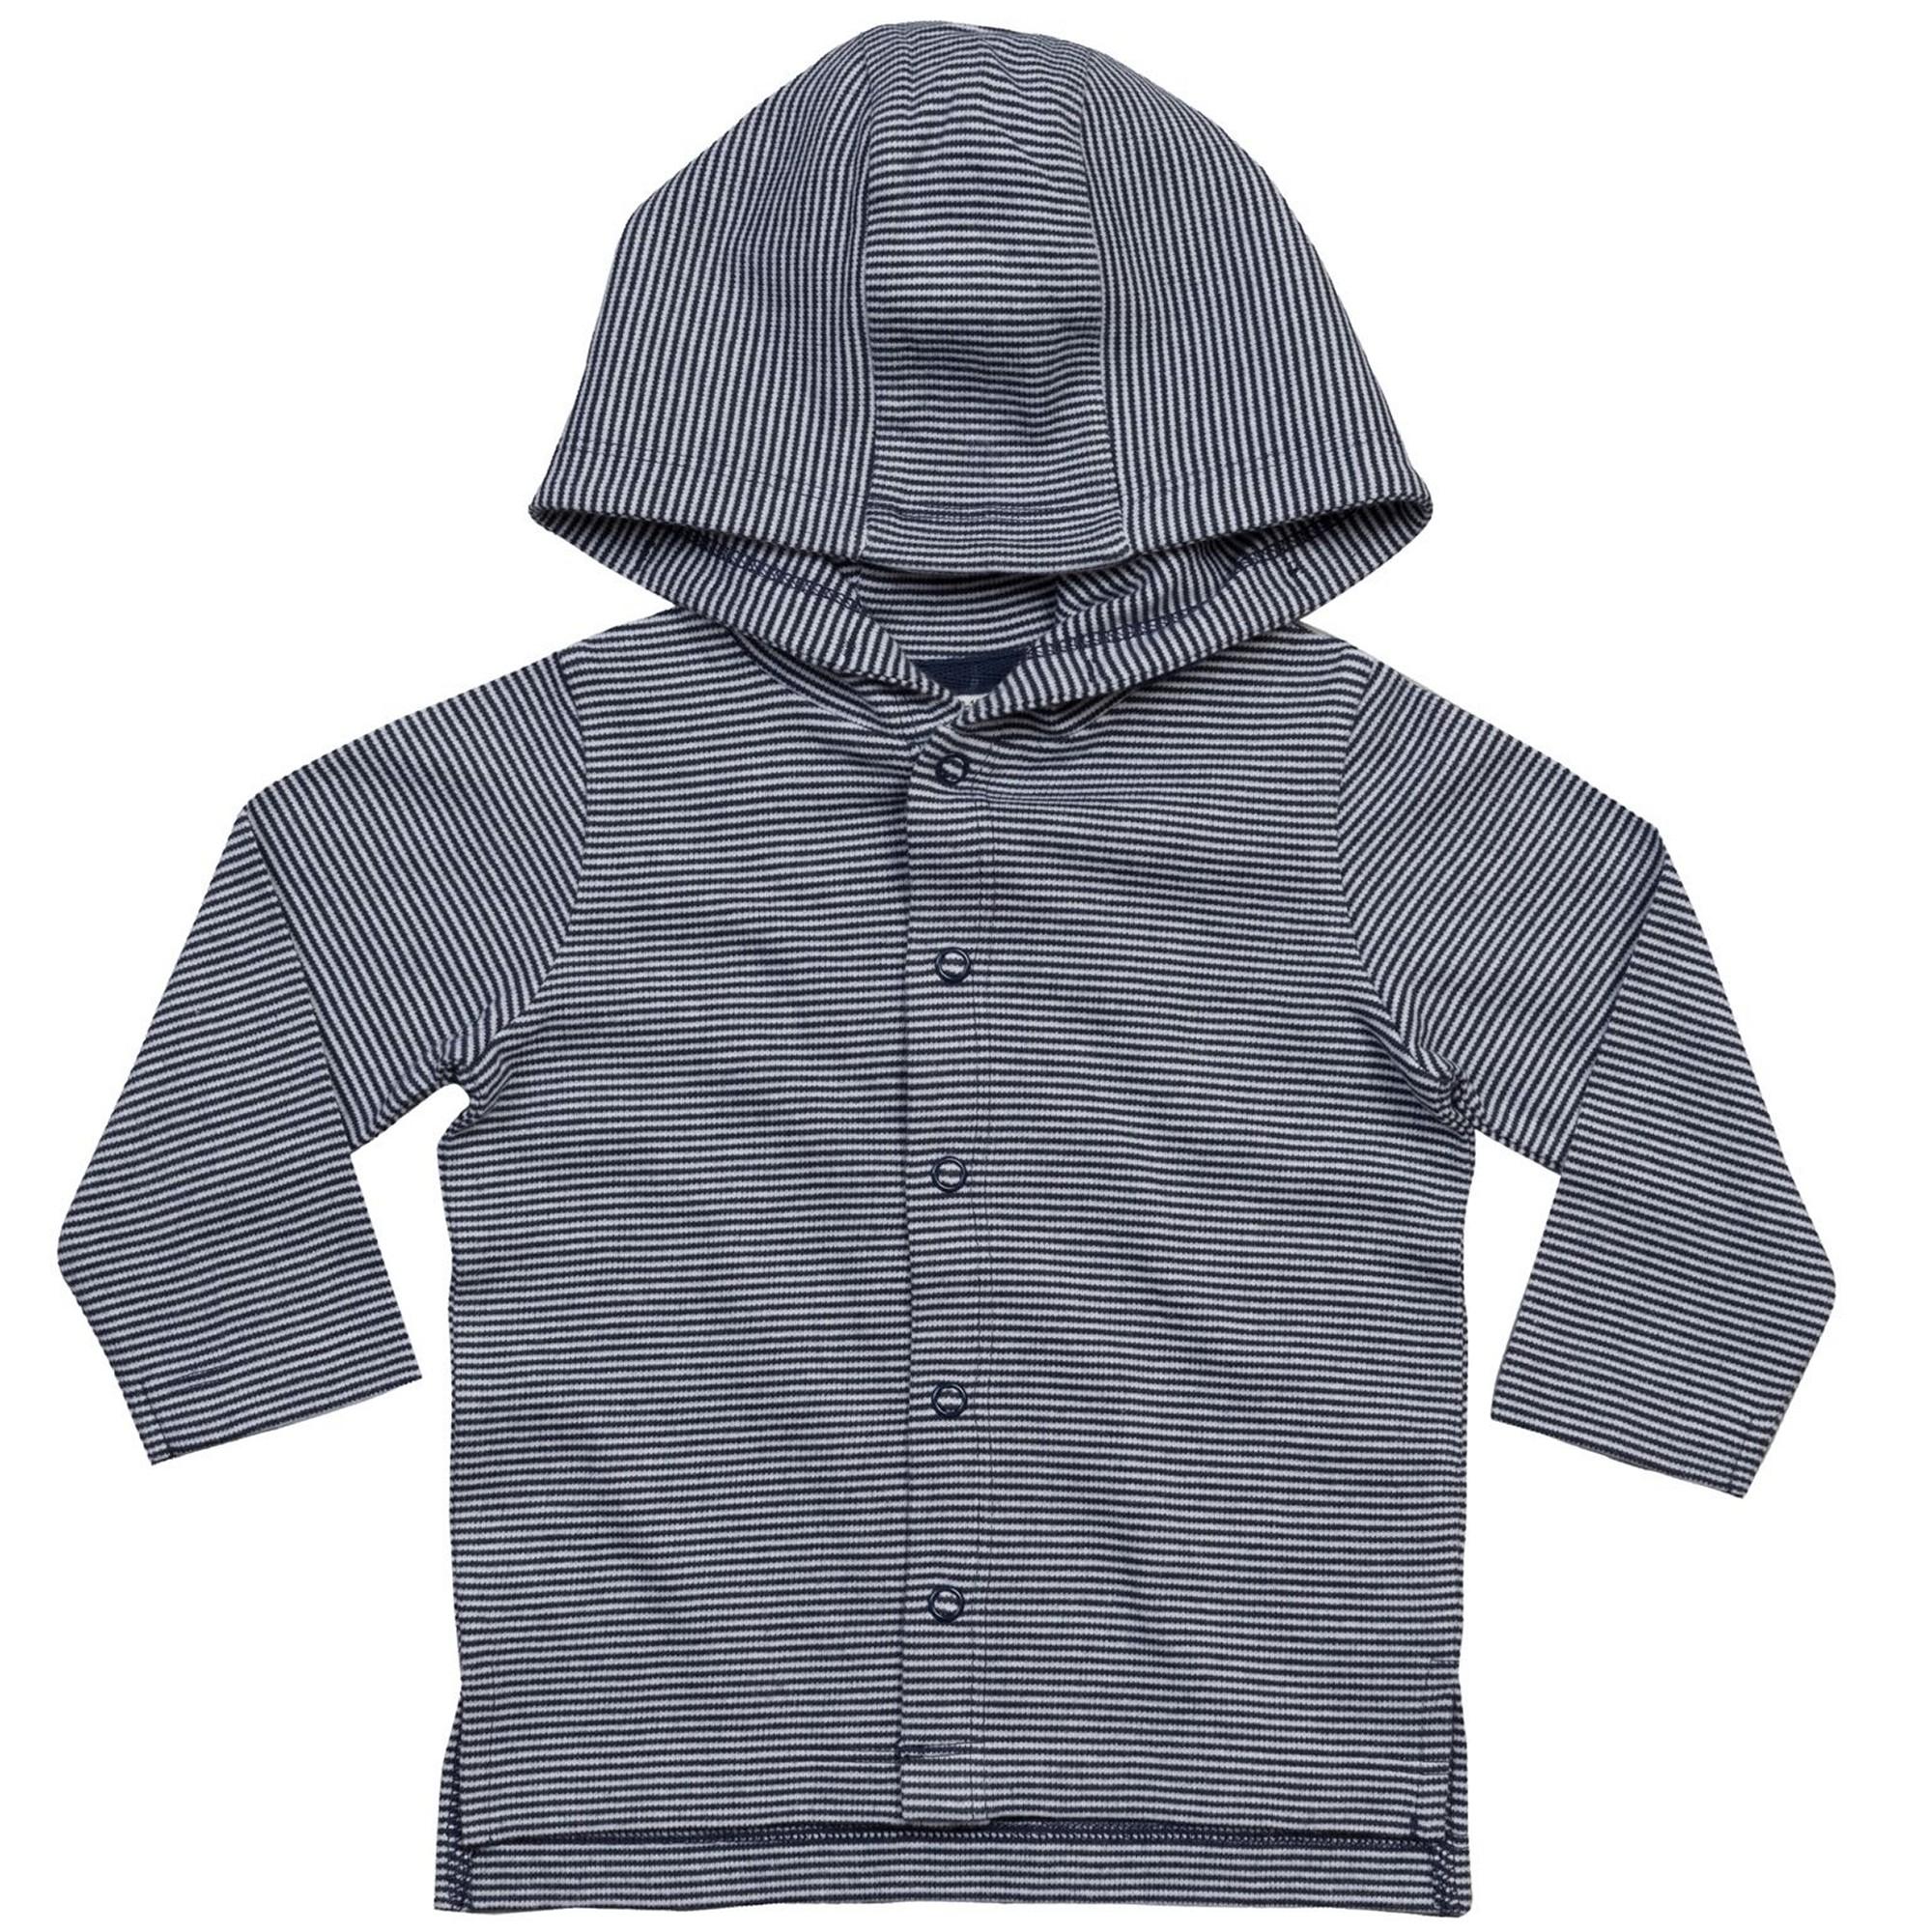 BabyBugz-Camiseta-a-rayas-con-capucha-para-bebes-PC3146